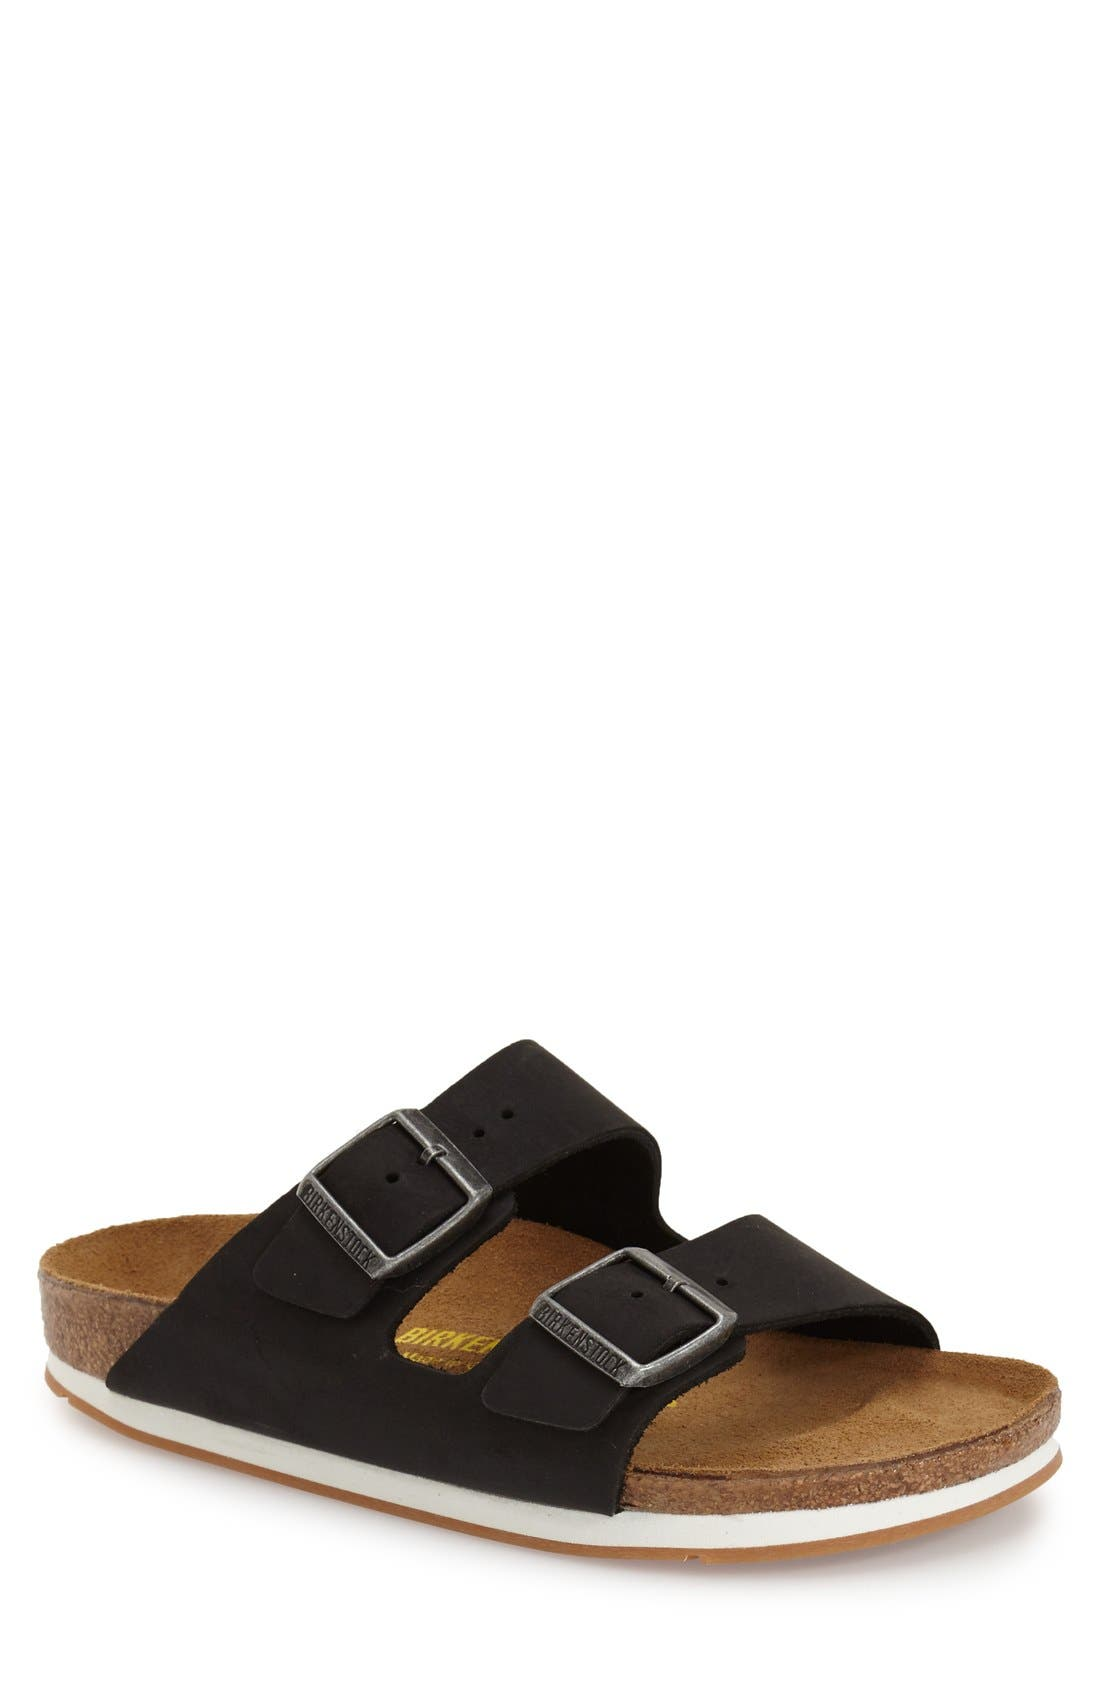 BIRKENSTOCK 'Arizona' Leather Slide Sandal, Main, color, 001